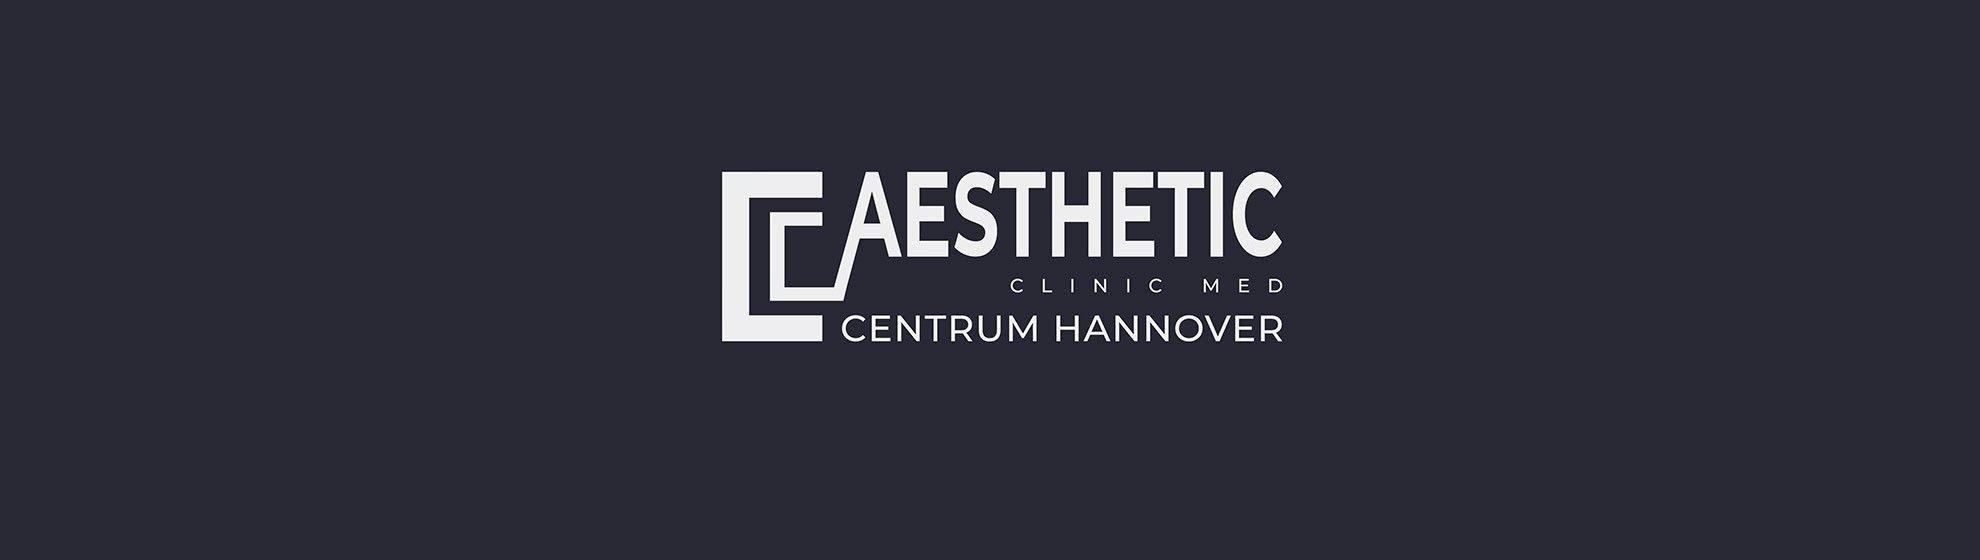 Aesthetic-Centrum Hannover GmbH